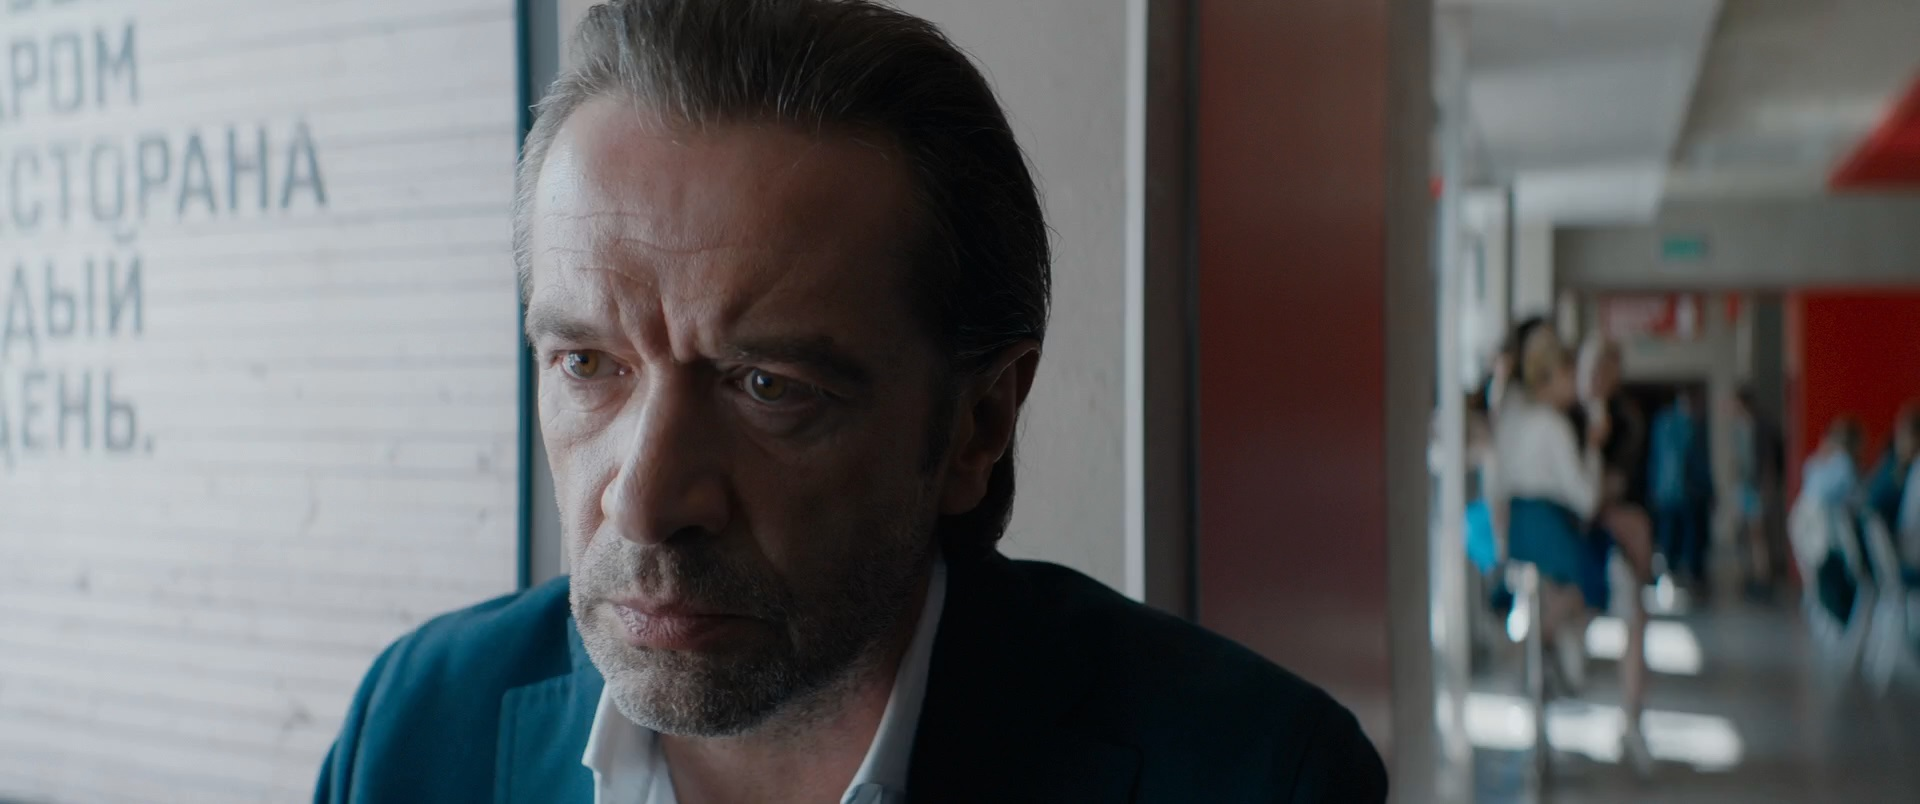 Milyoner Baba   Milliard   2019   WEB-DL   XviD   Türkçe Dublaj   m720p - m1080p   WEB-DL   Dual   TR-EN   Tek Link